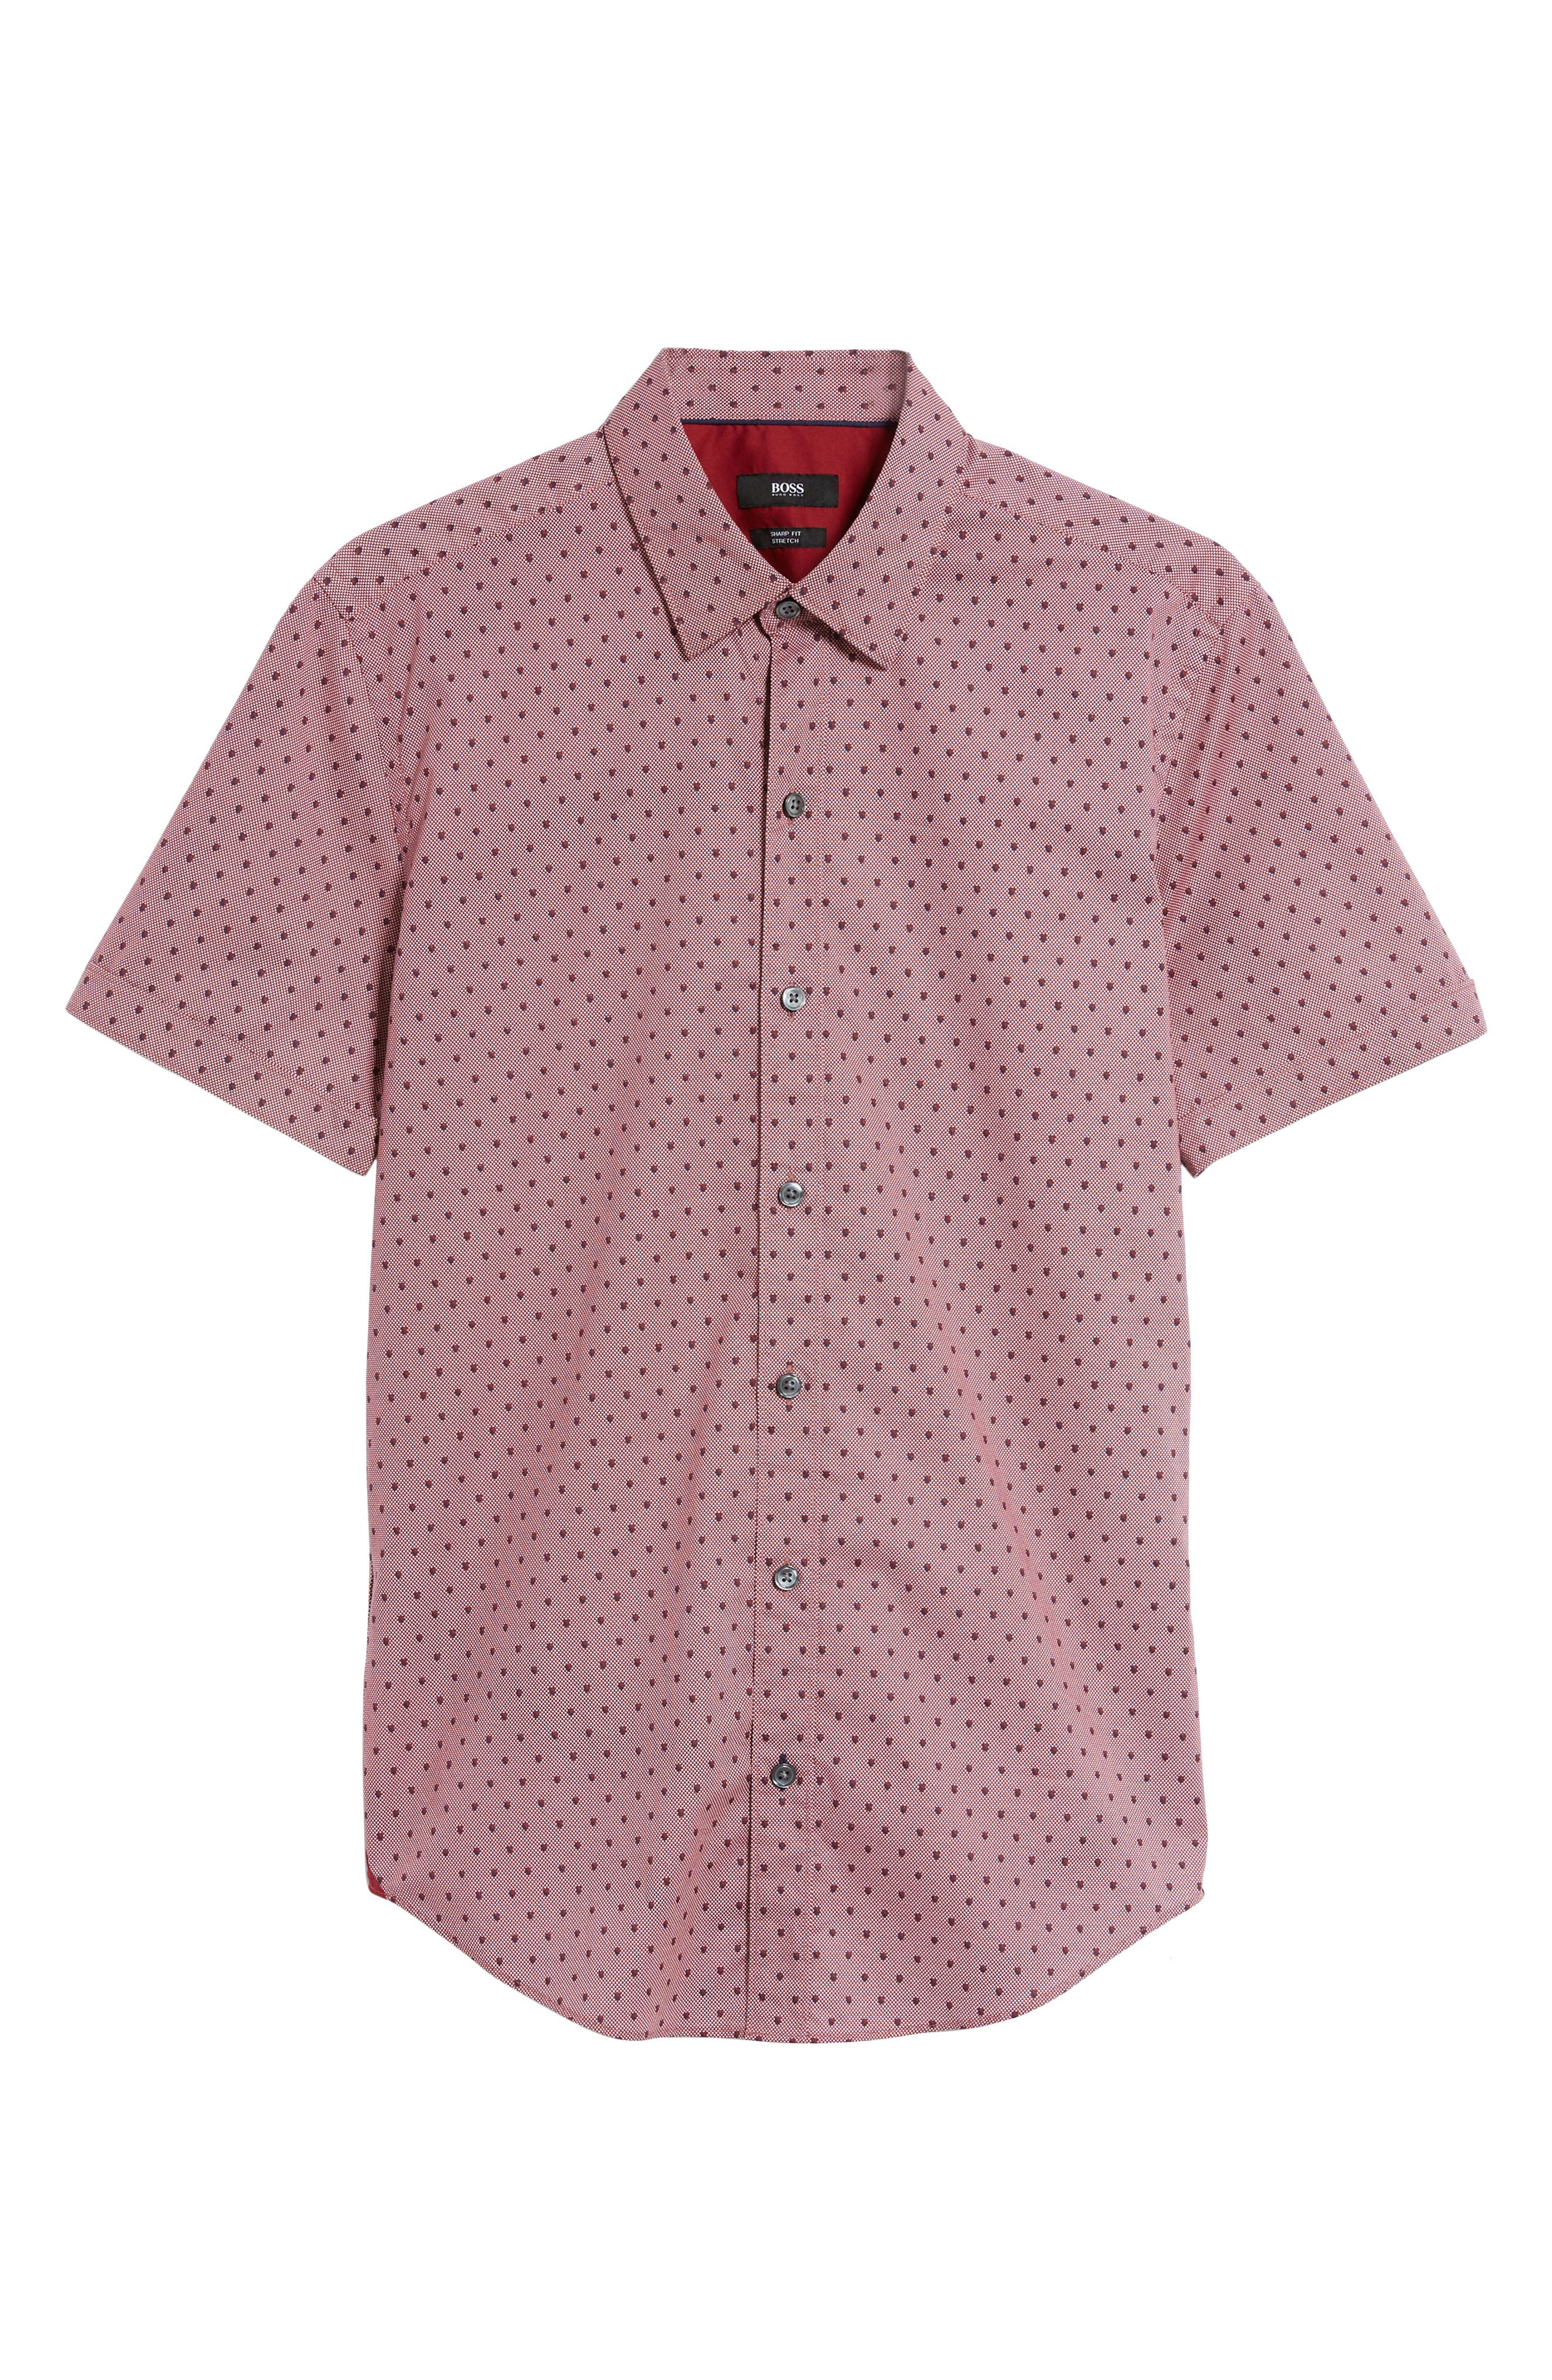 Robb Sharp Fit Print Sport Shirt,                             Alternate thumbnail 5, color,                             Red